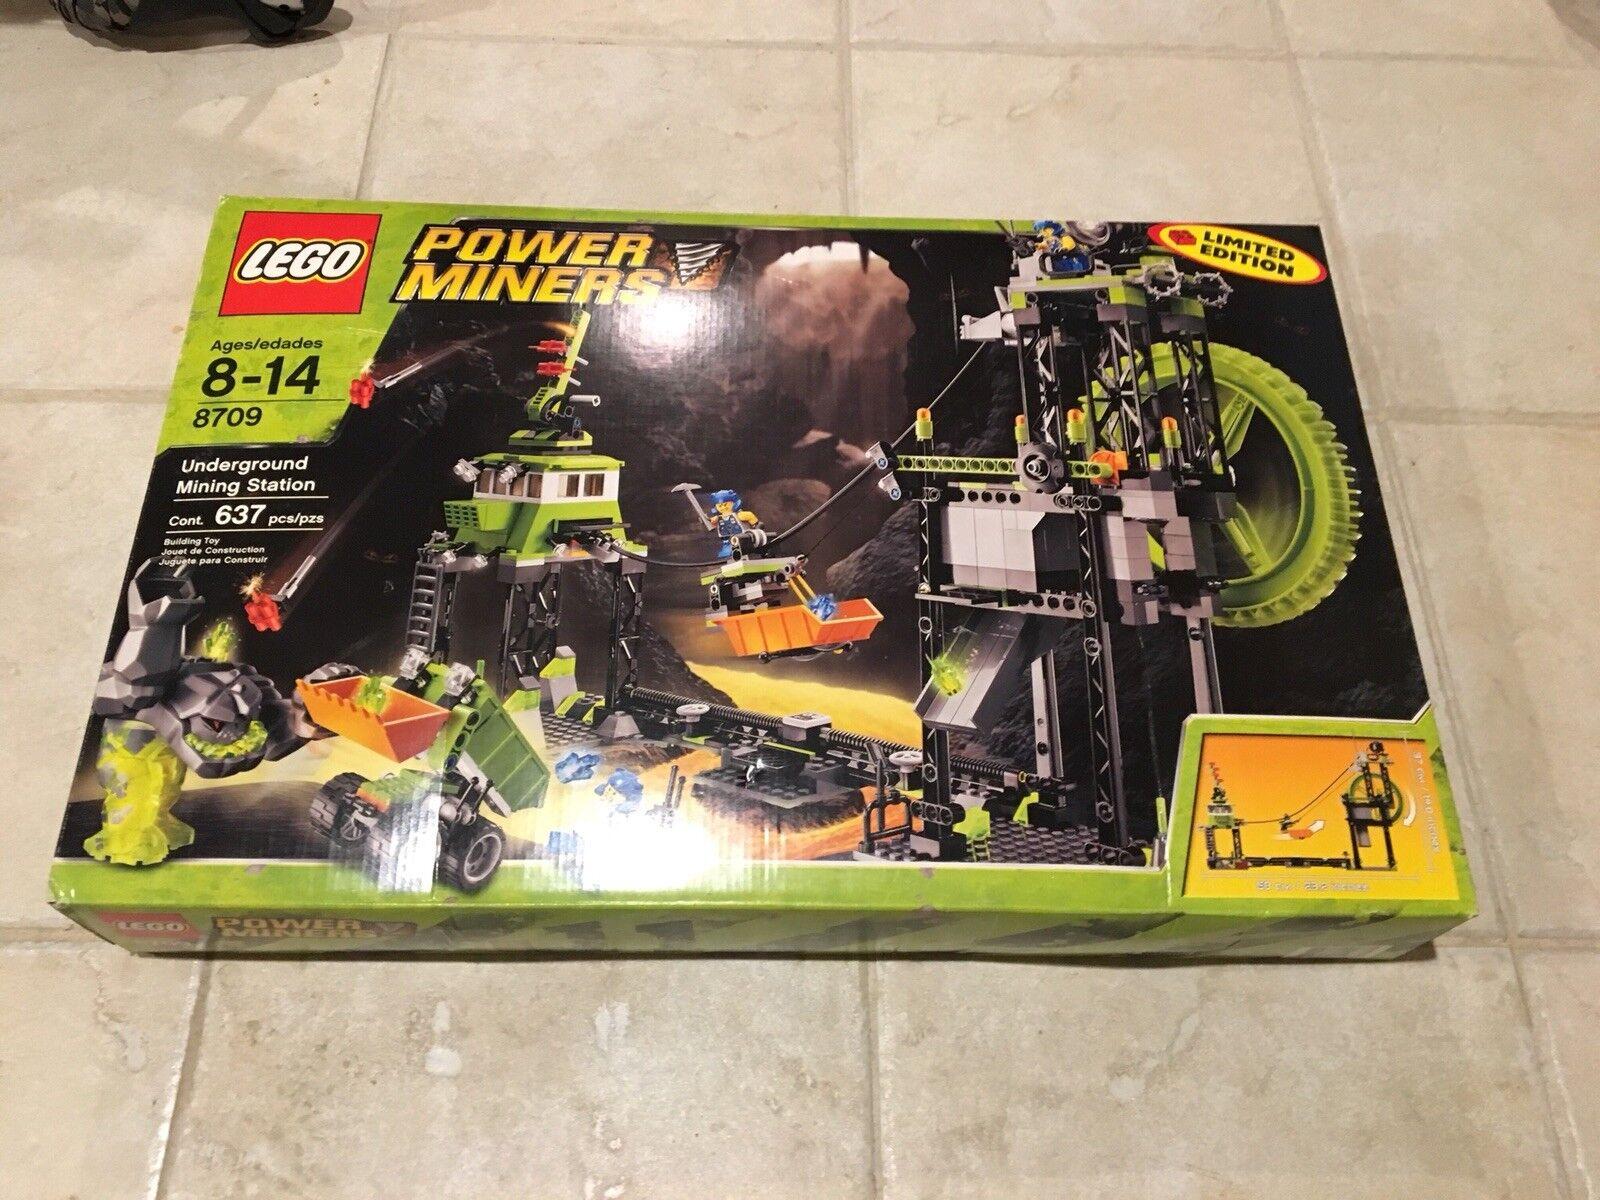 Lego Power Miners Underground Mining Station  8709  brand new, sealed, unopened